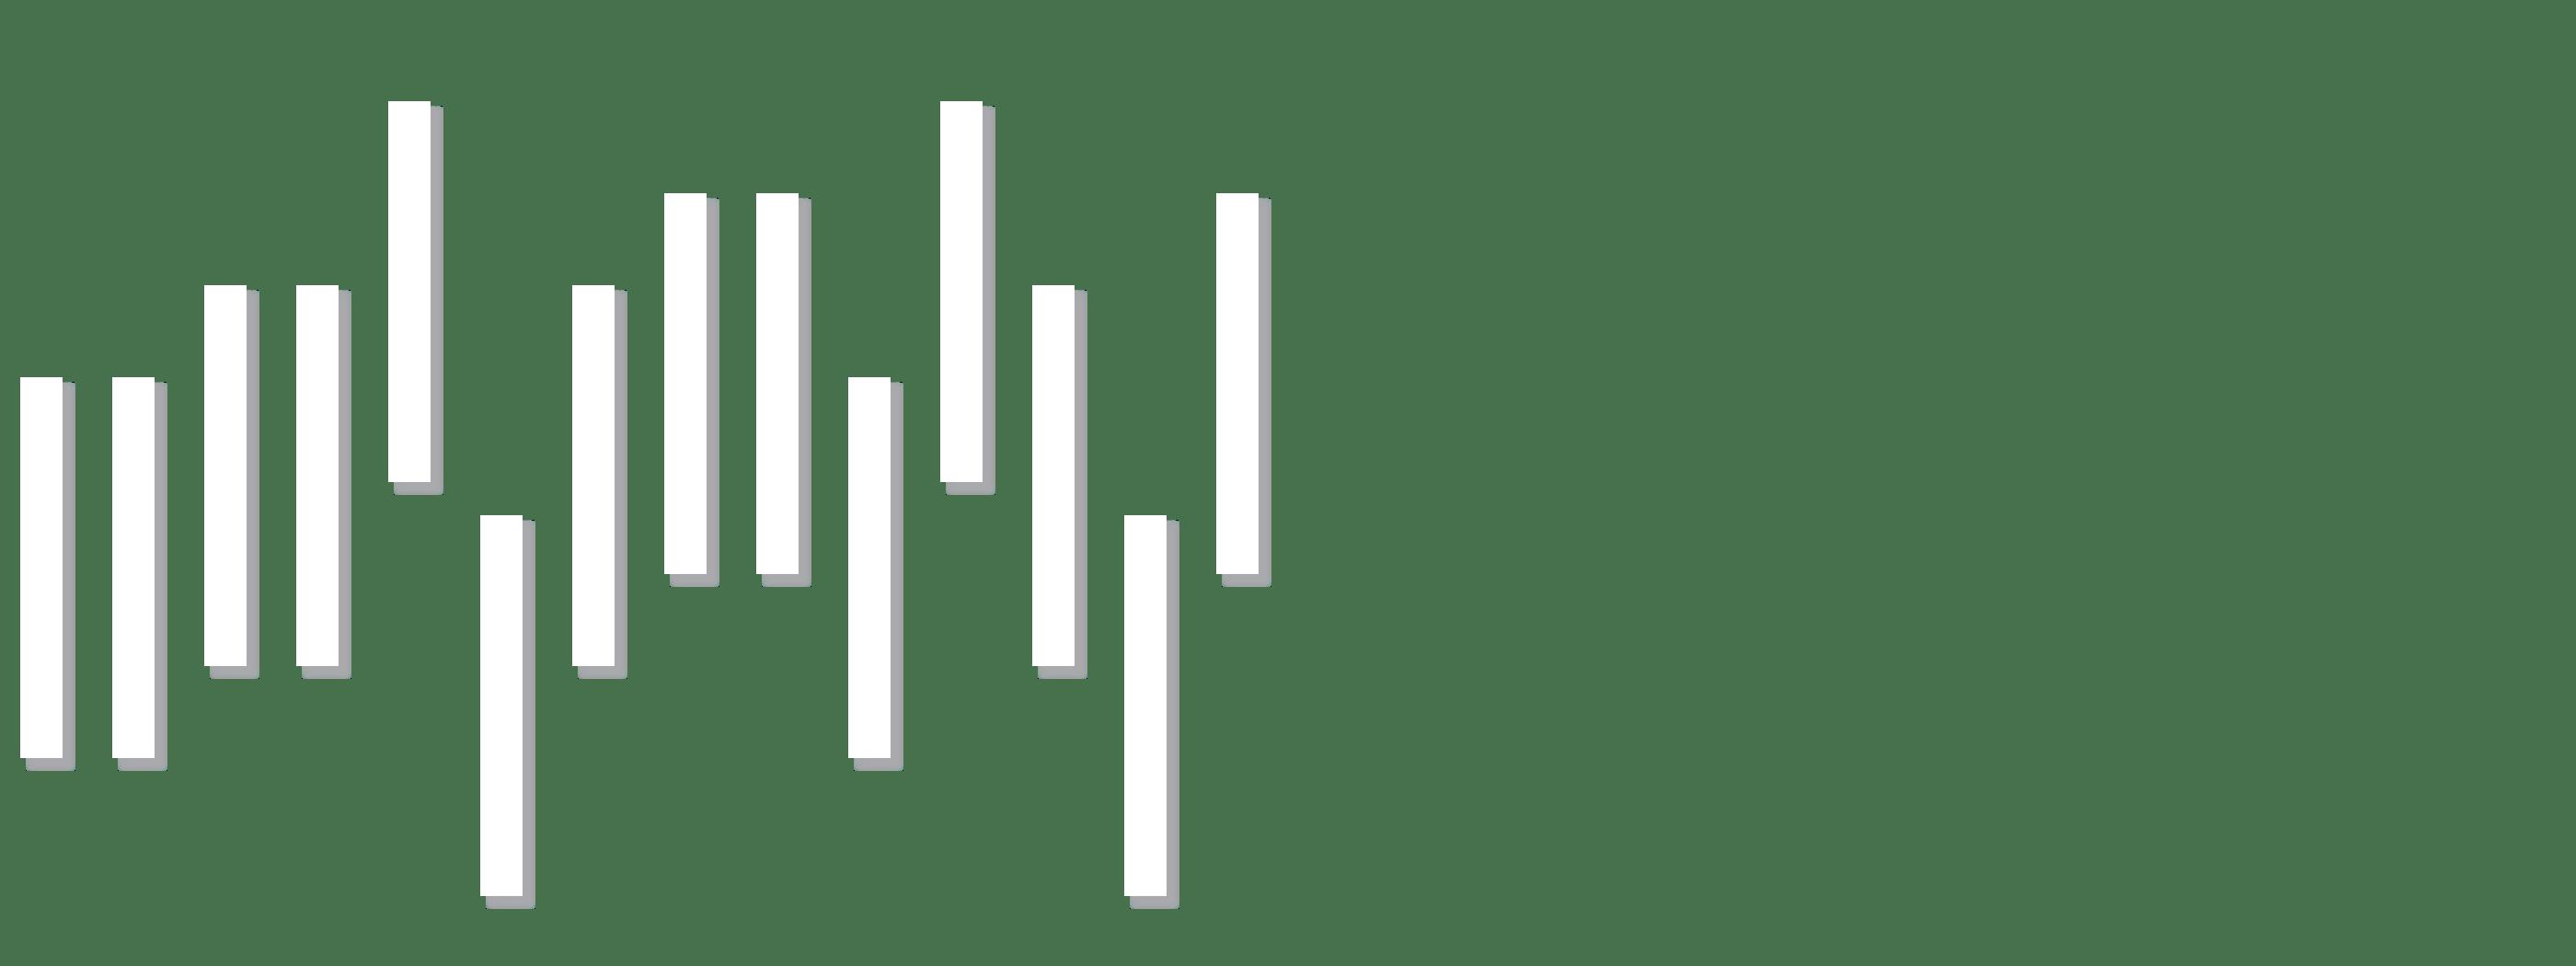 Interactive parallax image